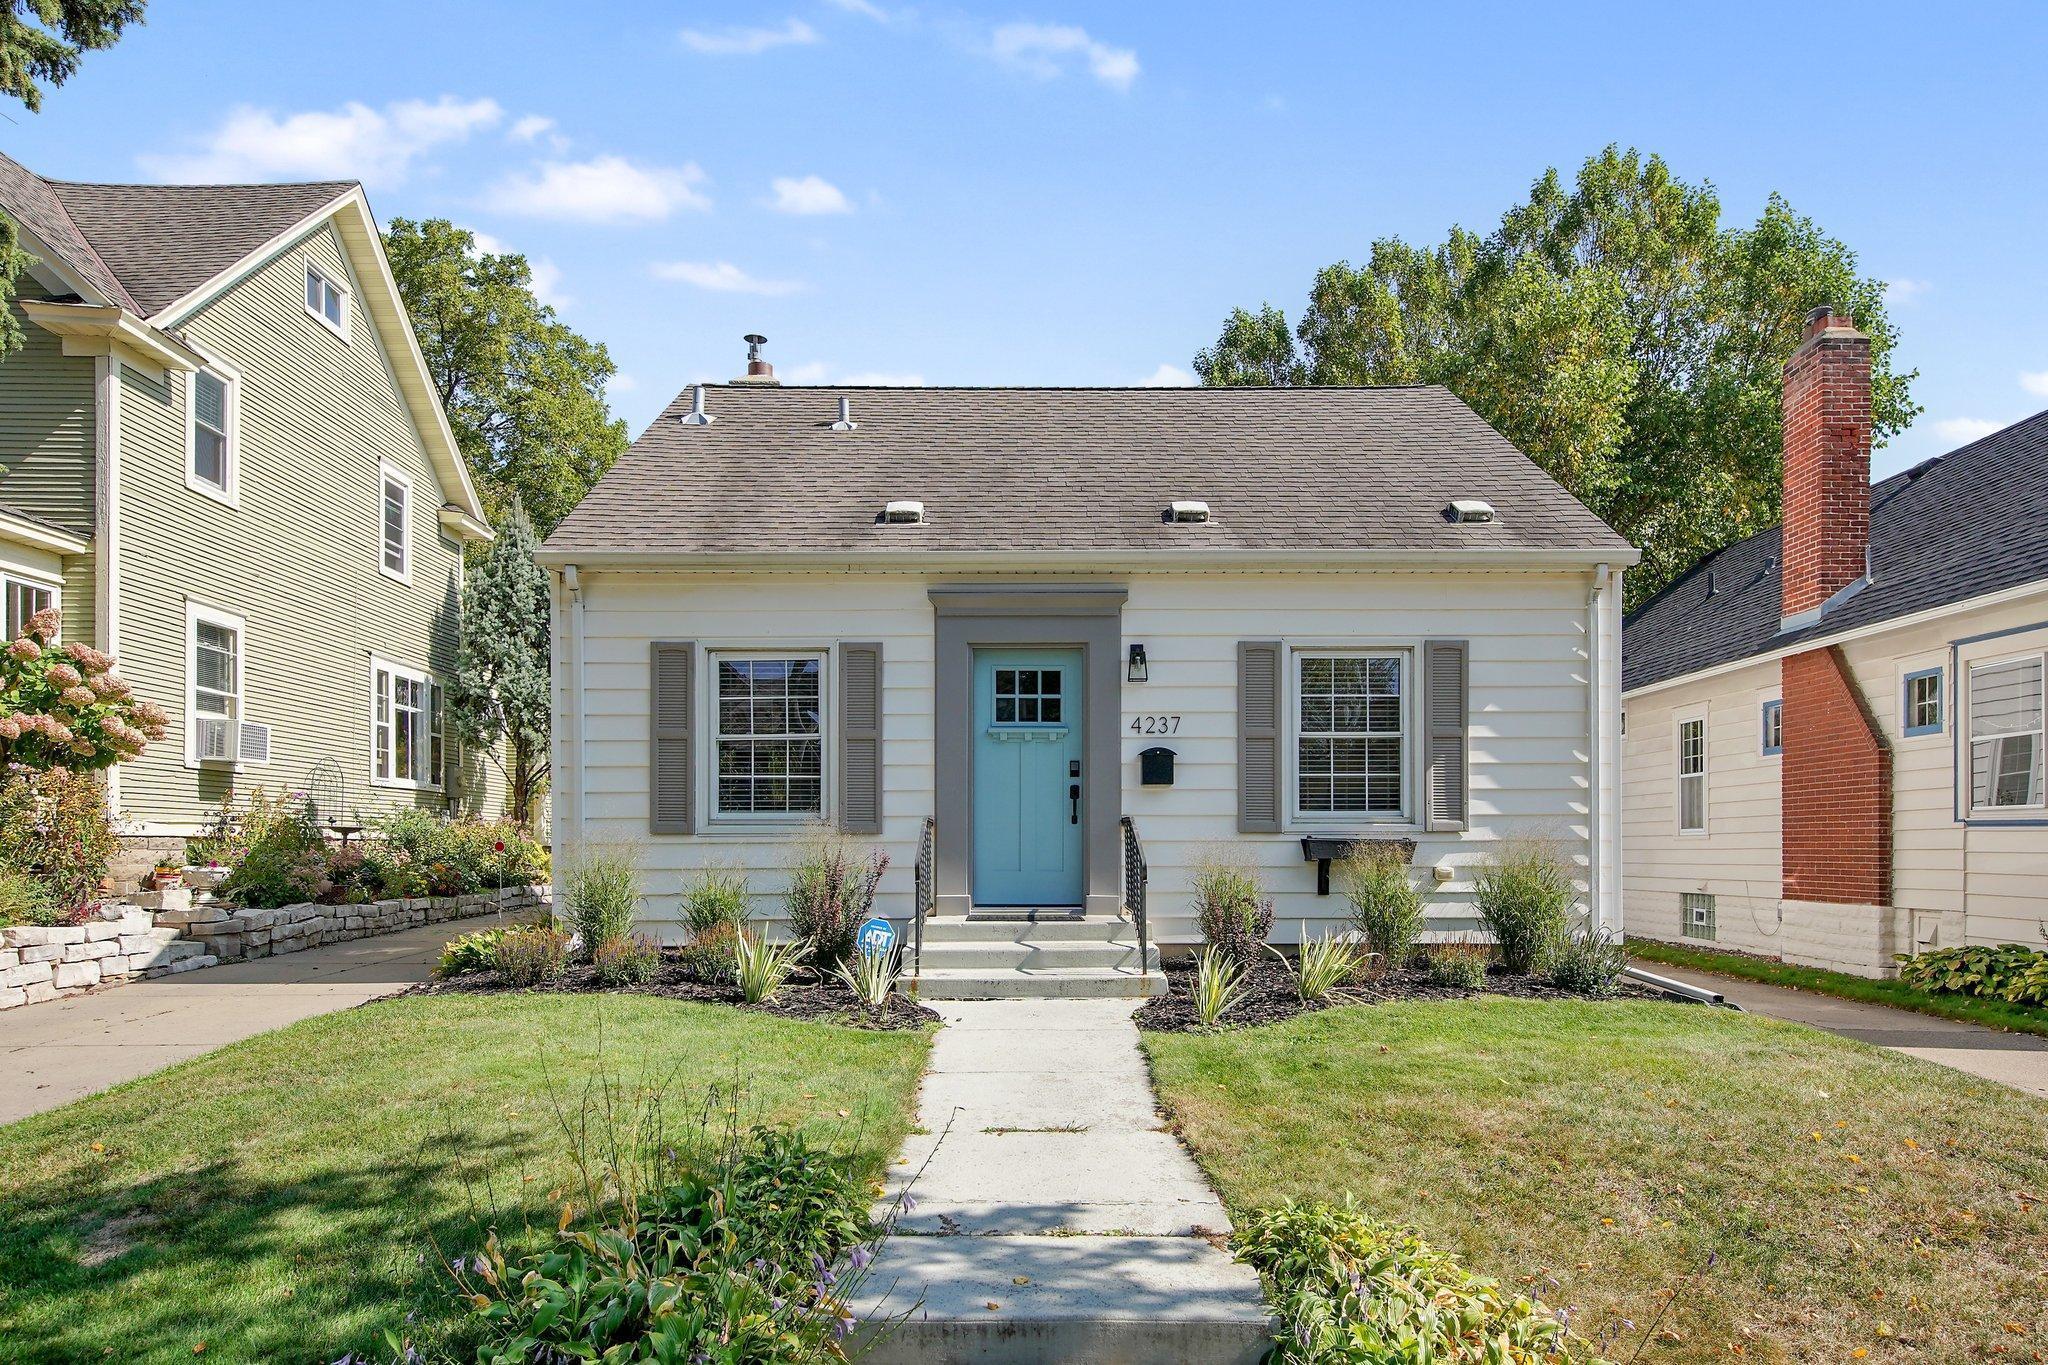 4237 Aldrich Avenue S Property Photo - Minneapolis, MN real estate listing